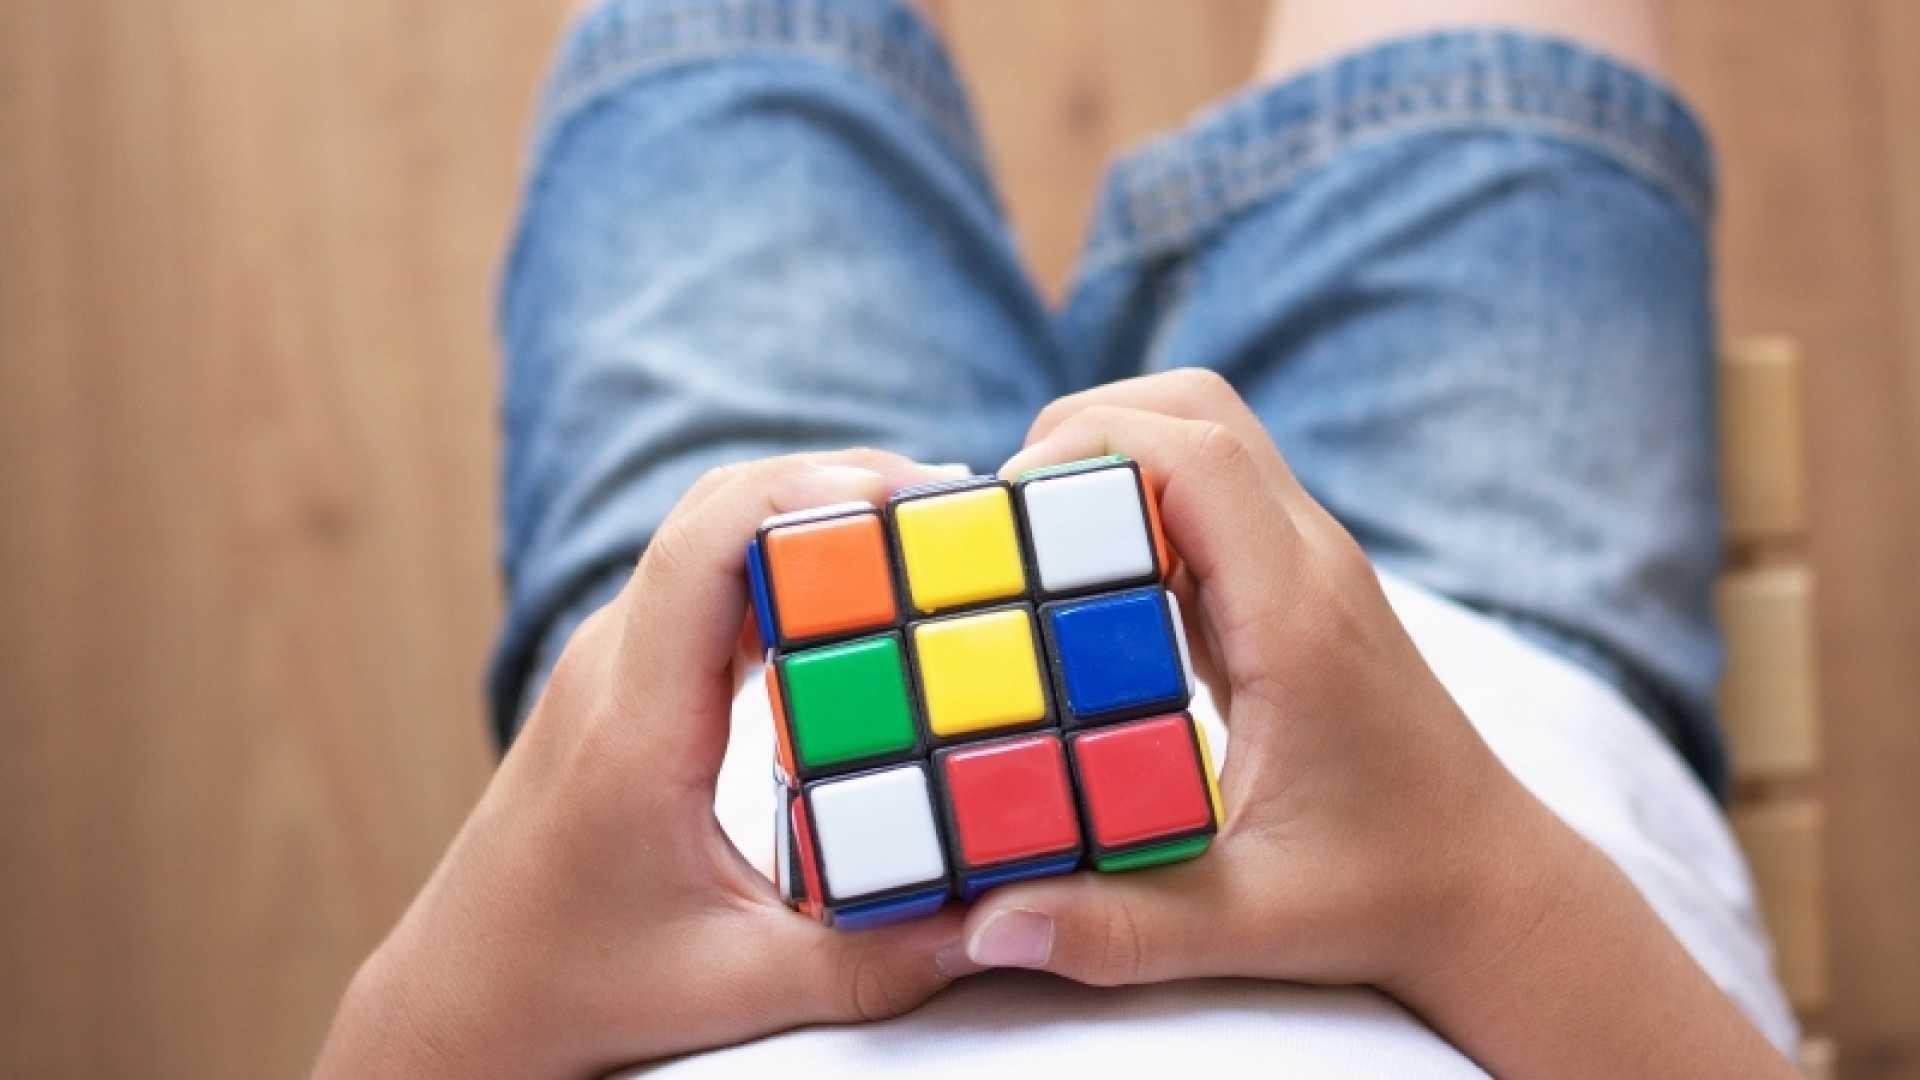 4 Mental Skills Every Business Leader Needs